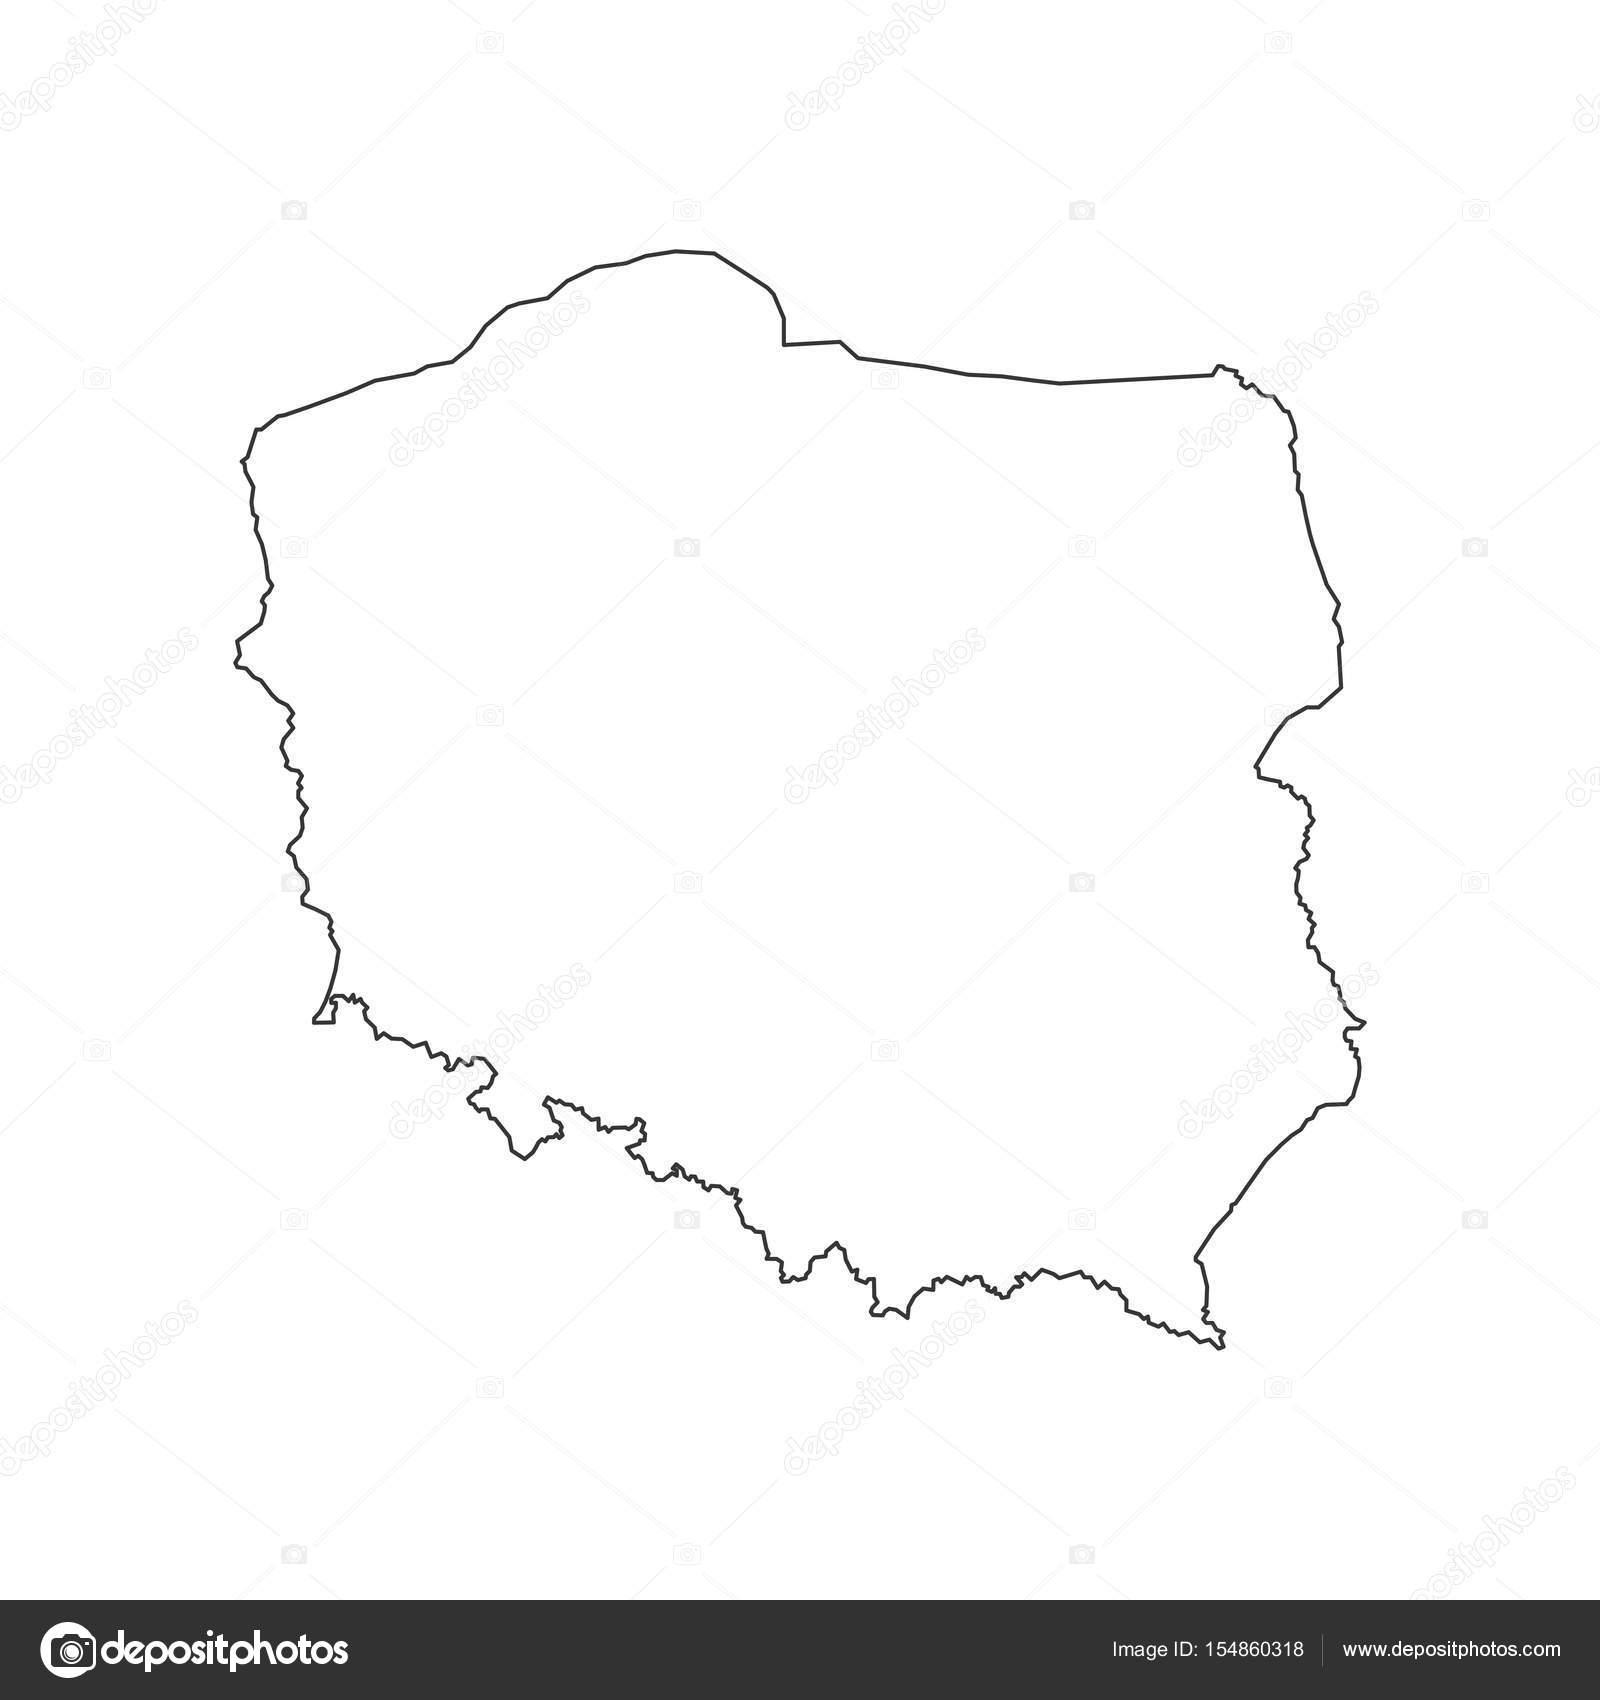 Polen Karte Umriss.Polen Karte Kontur Stockvektor C Parkheta Gmail Com 154860318